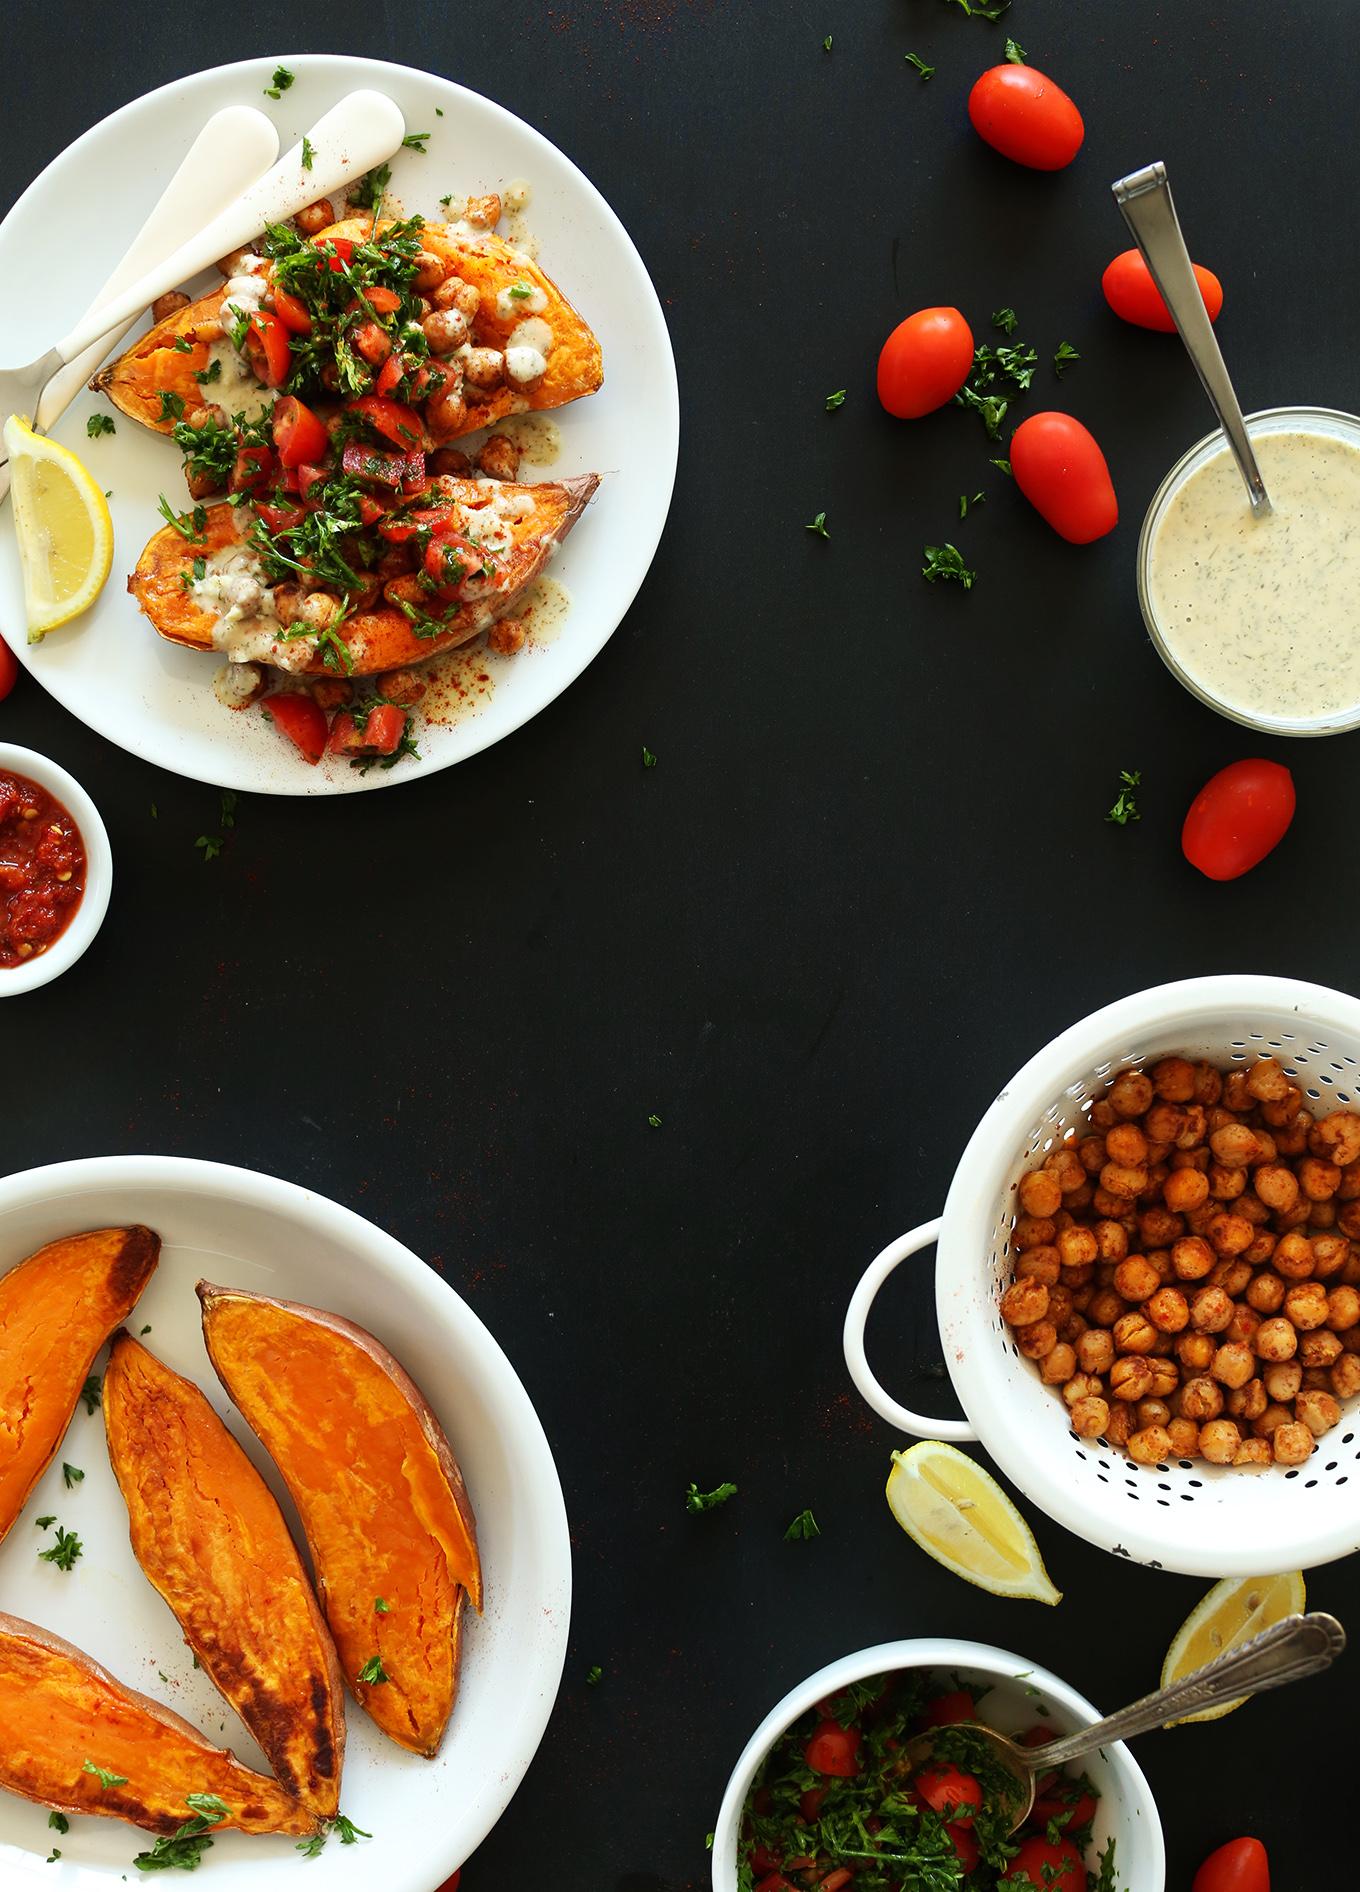 Plate of gluten-free vegan Mediterranean Baked Sweet Potatoes alongside ingredients for making them